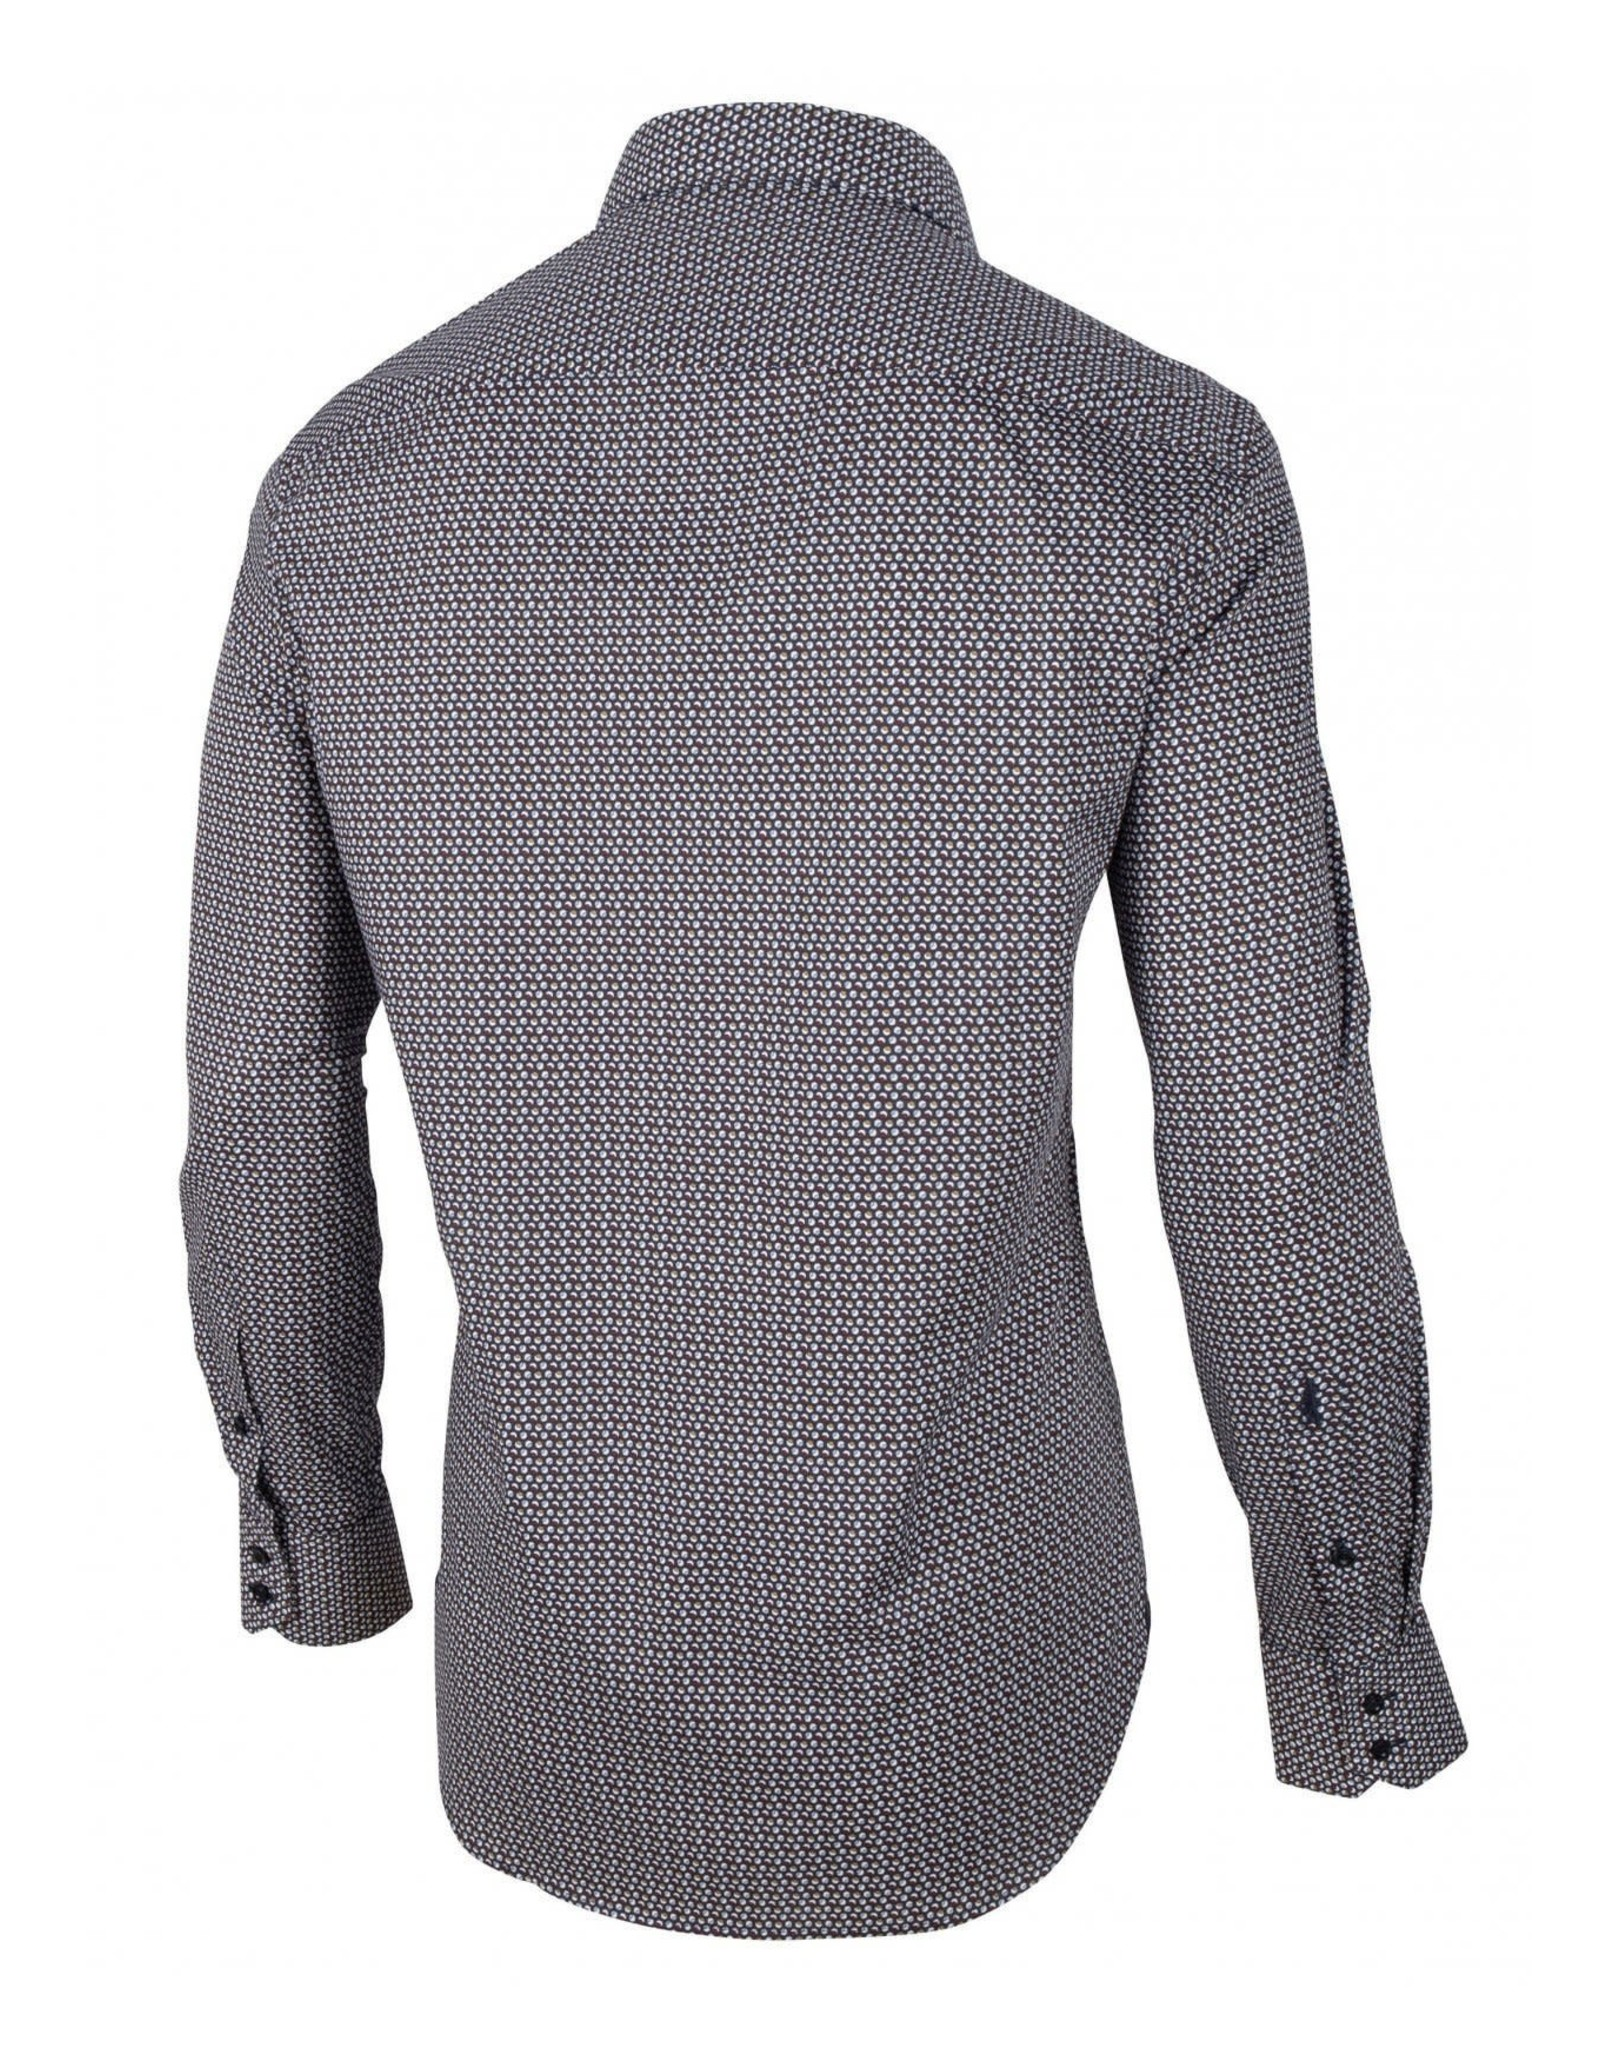 Cavallaro Cavallaro Ballino shirt Dark navy